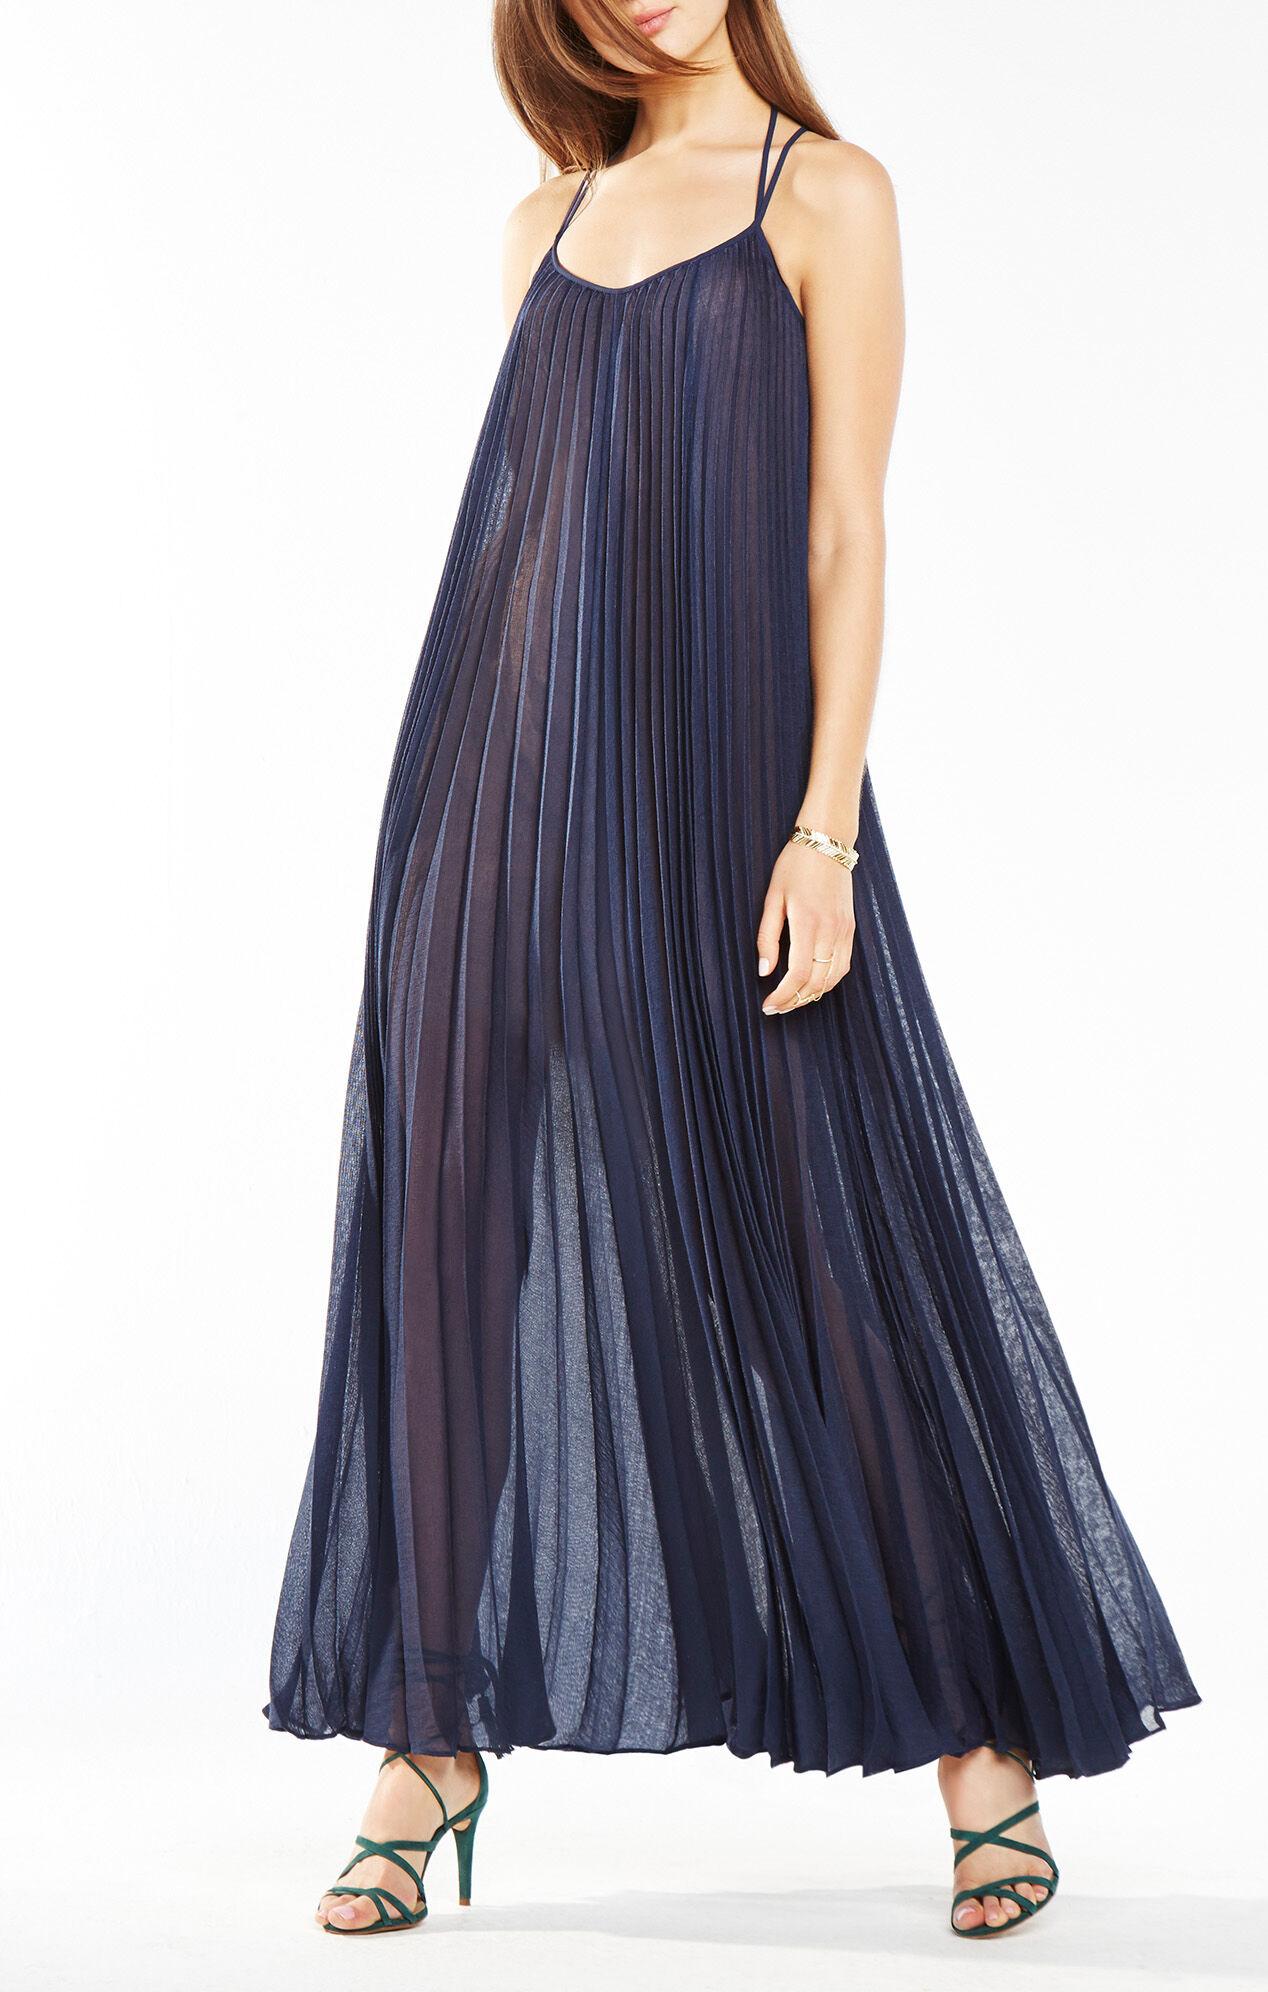 Bcbg petite maxi dress